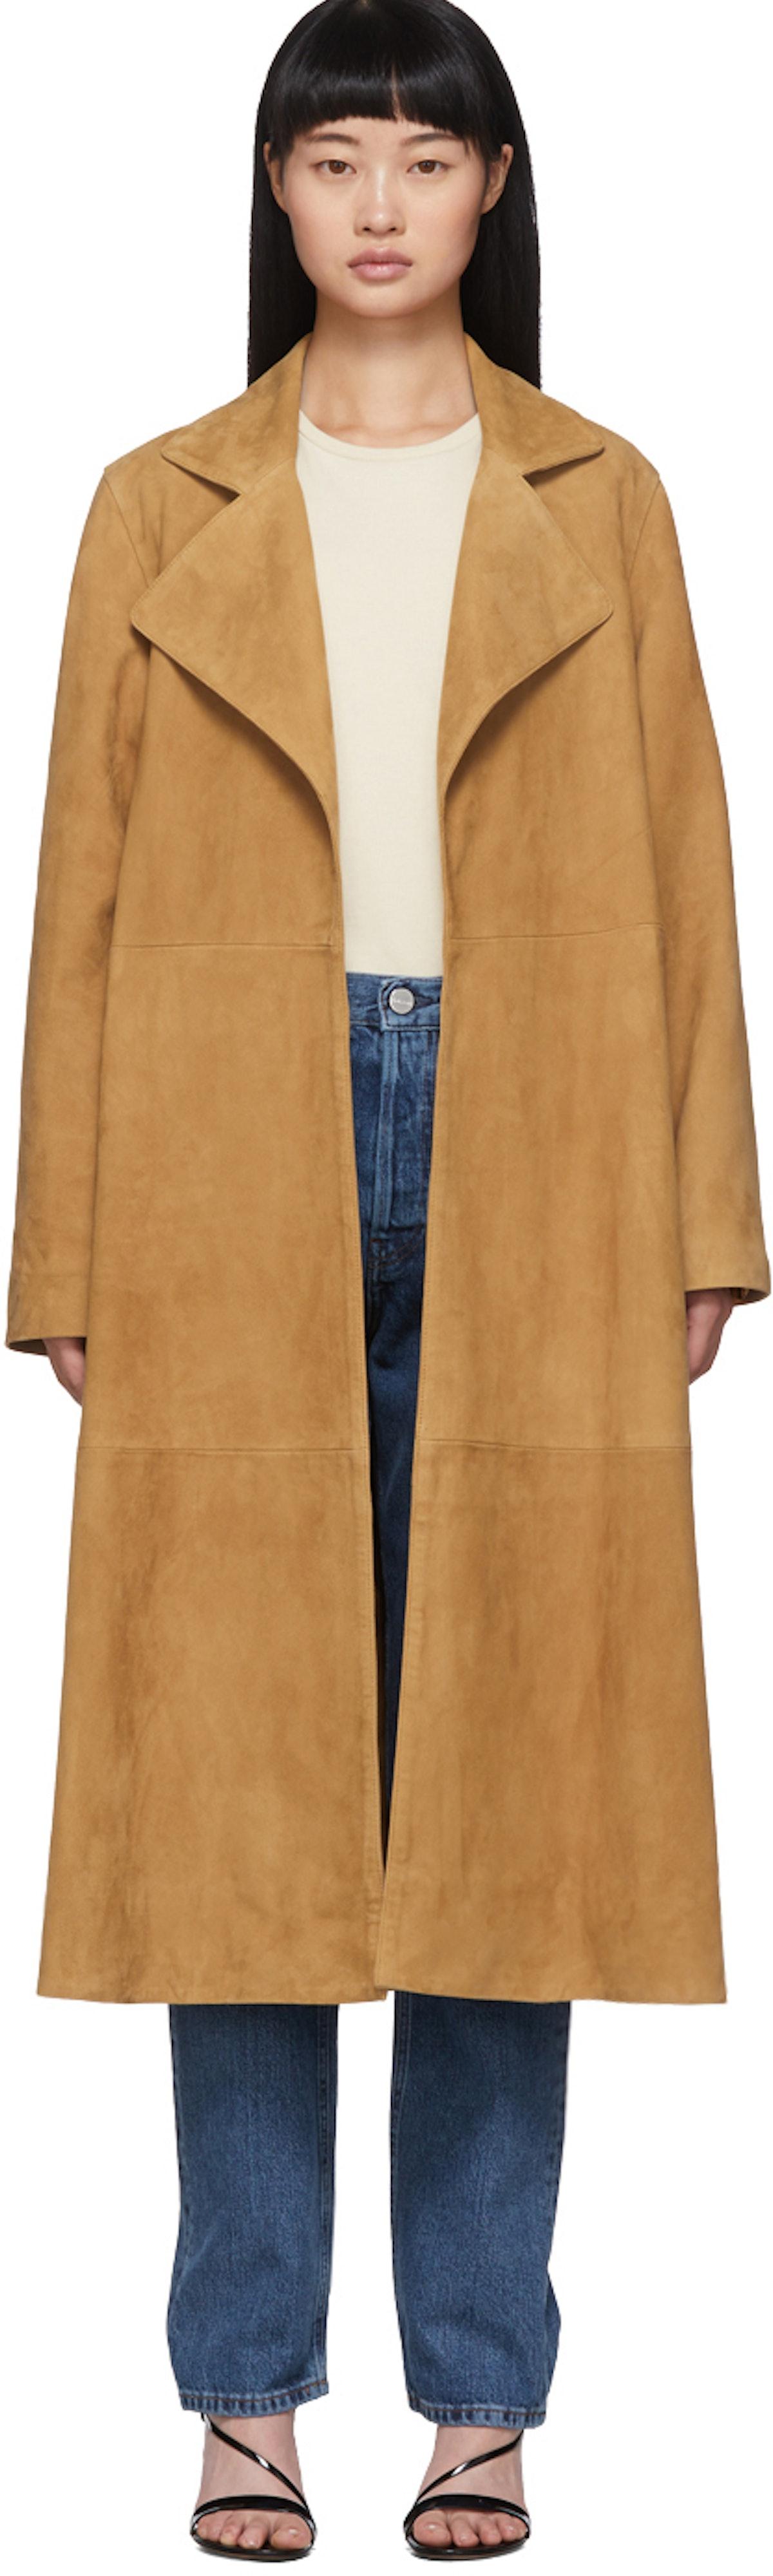 Tan Zadar Suede Coat